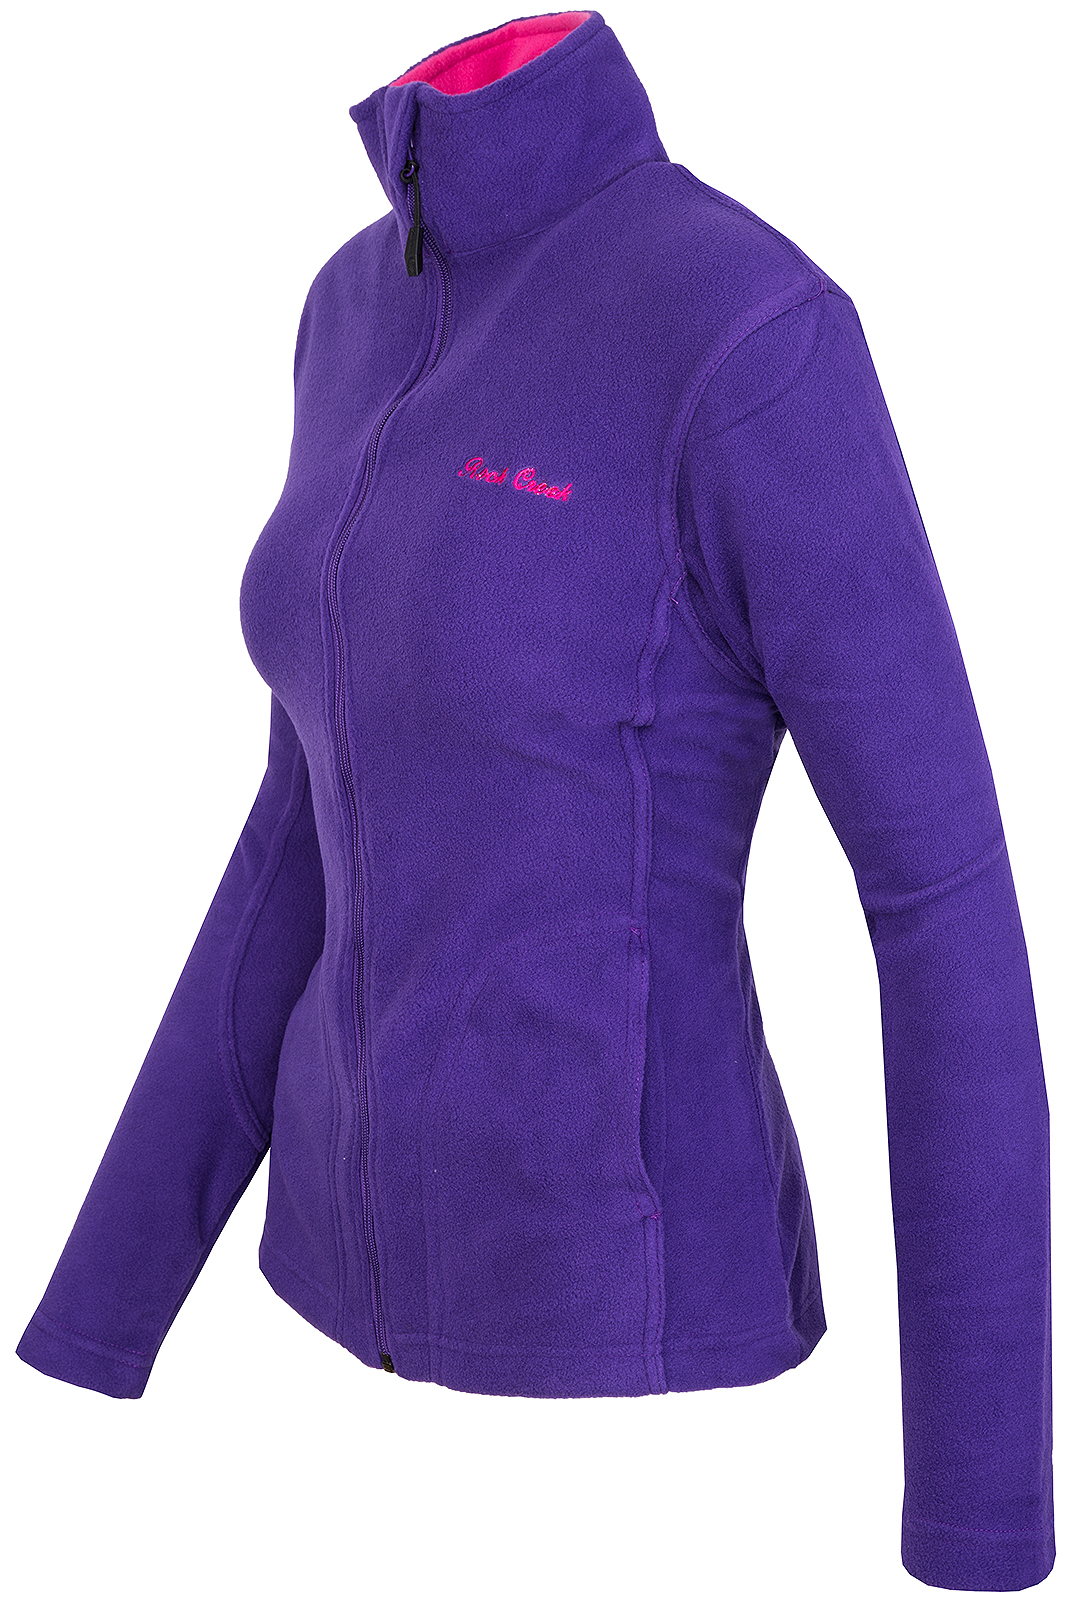 Details about Rock Creek Womens Fleece Jacket Fleece Jacket Transition Jacket Sweat Jacket S XXL d 389 show original title